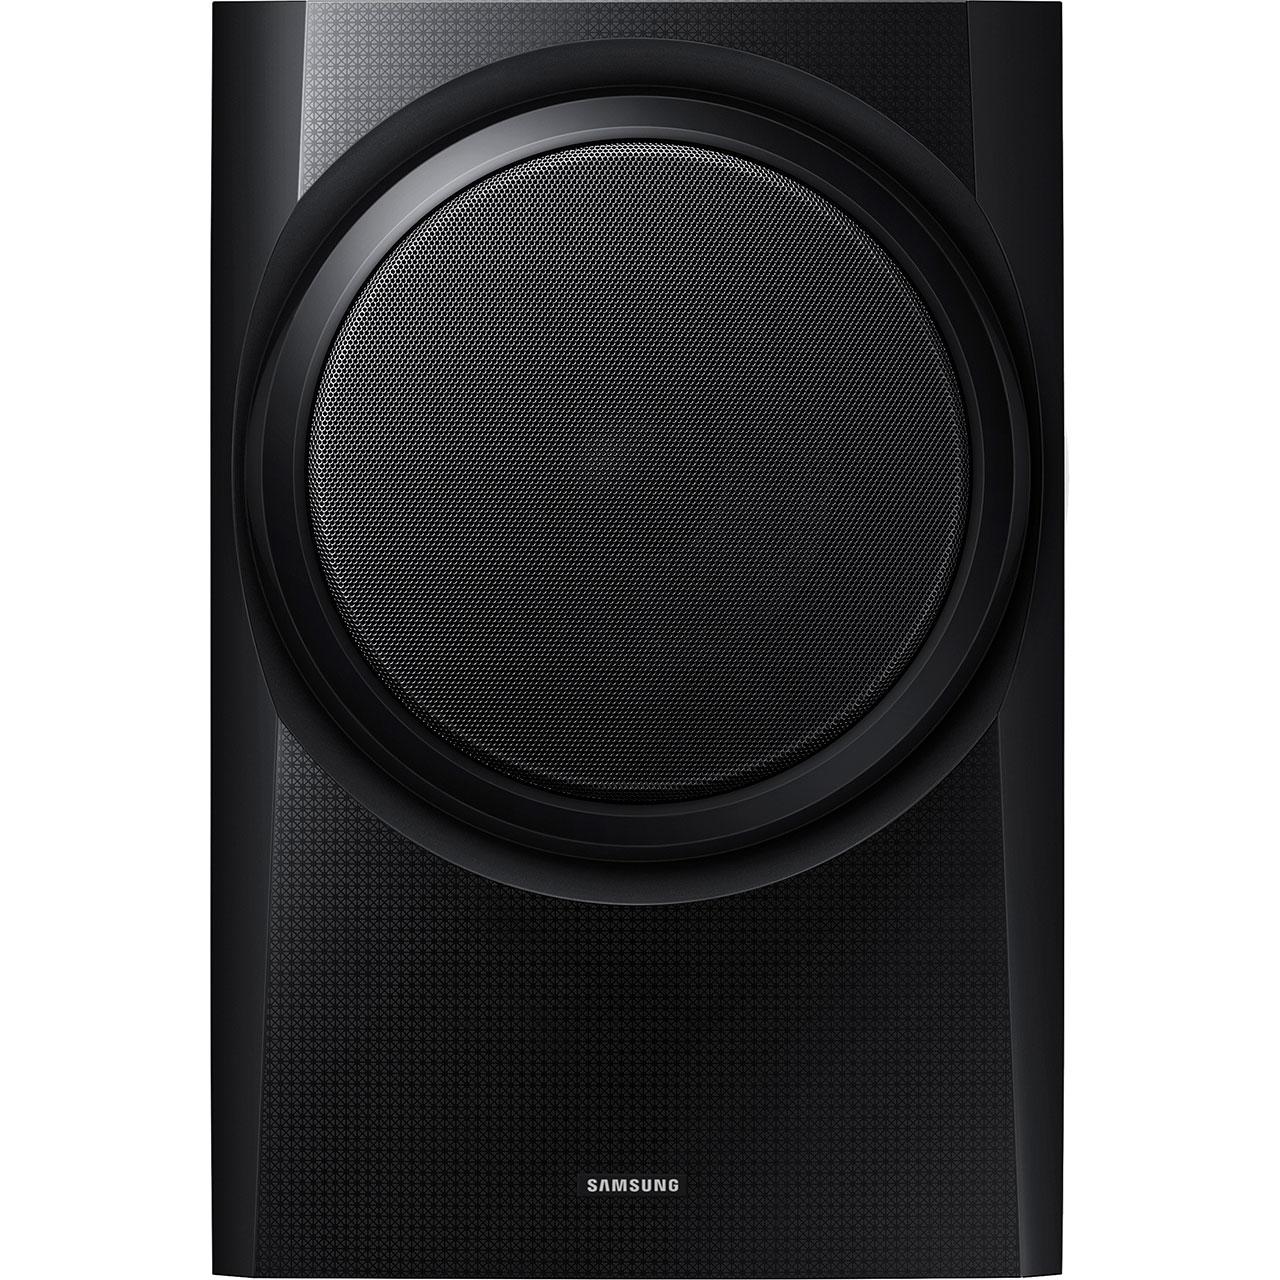 samsung hw k335 130 watt soundbar bluetooth with wired subwoofer black new ebay. Black Bedroom Furniture Sets. Home Design Ideas